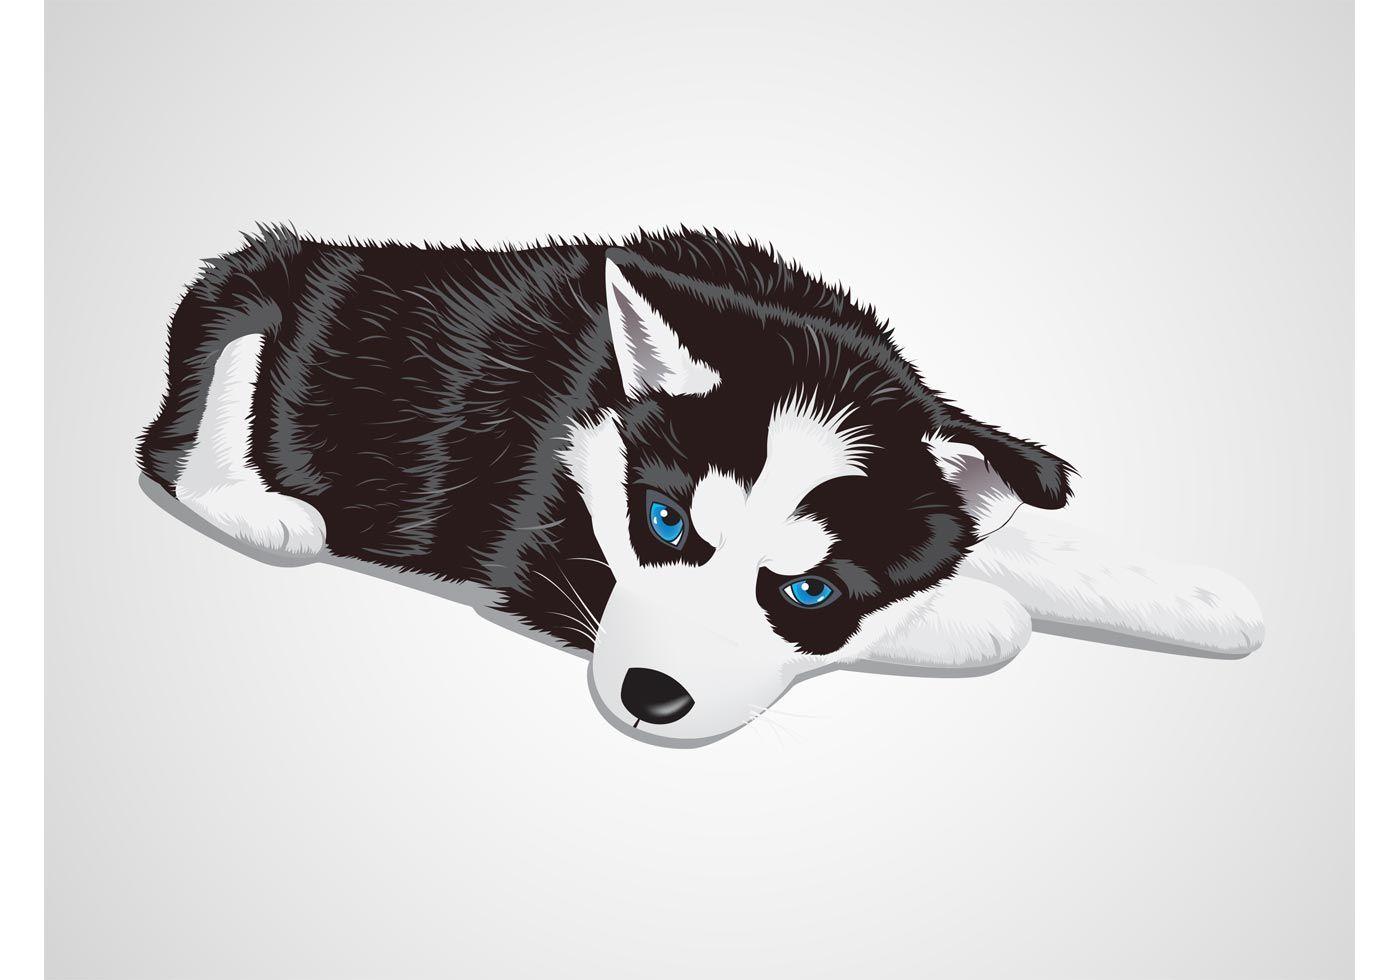 Vector graphics of a baby husky dog. Cute animal lying